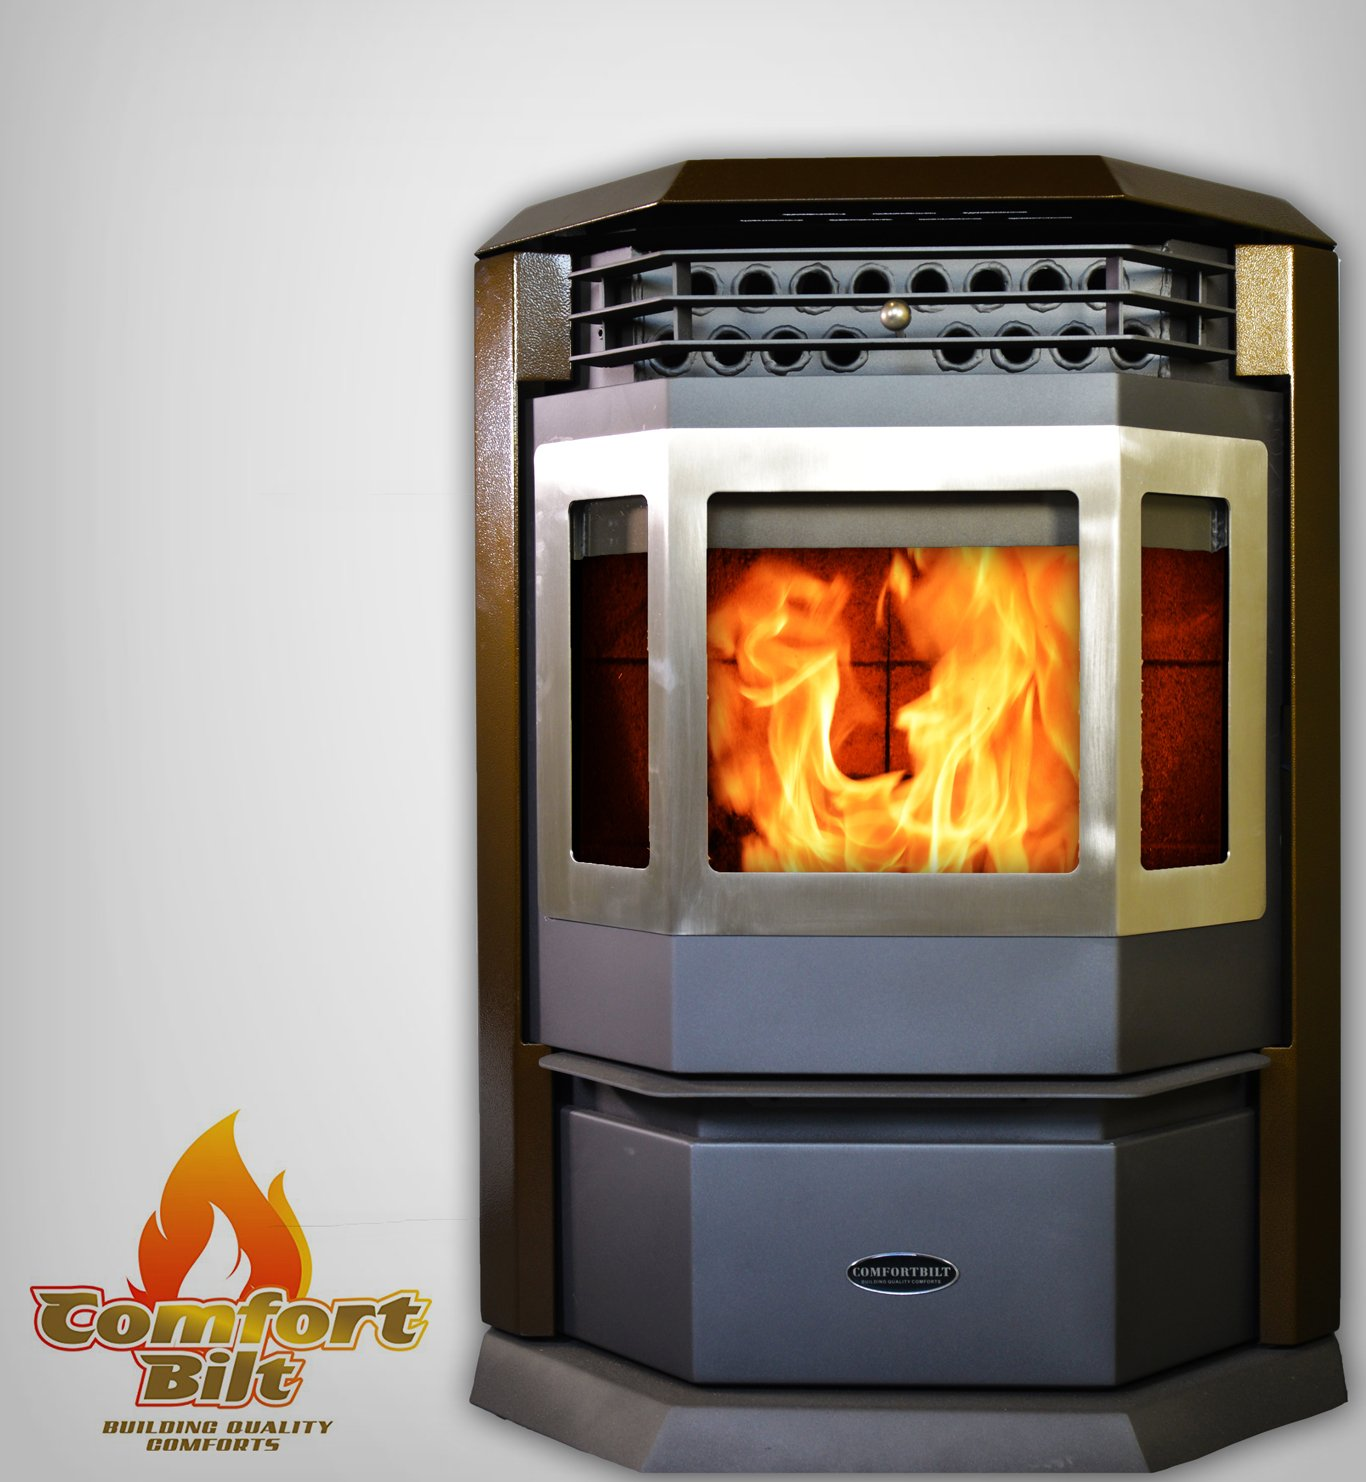 Comfortbilt Pellet Stove HP22-SS- 50,000 btu - Stainless Steel Golden Brown! by Comfortbilt